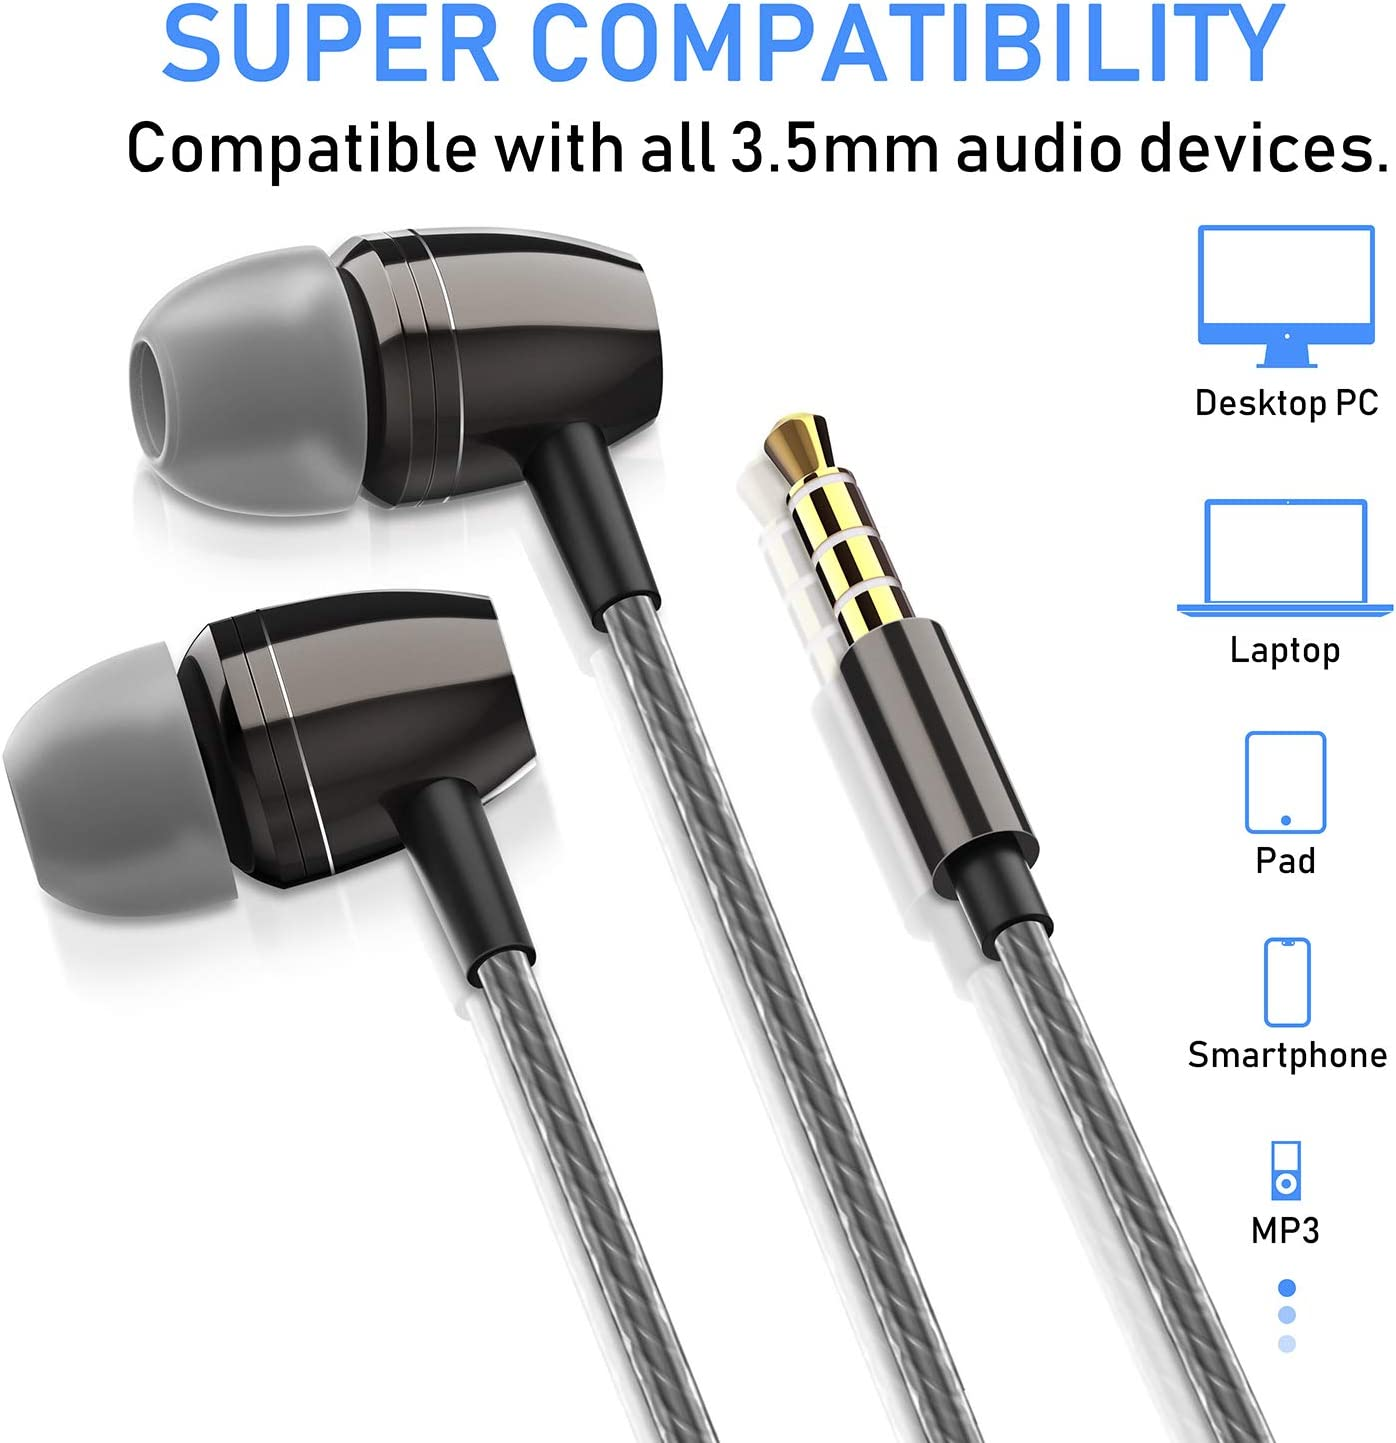 Blukar Auricolari, Ear Auricolari Cuffie Stereo in Metallo